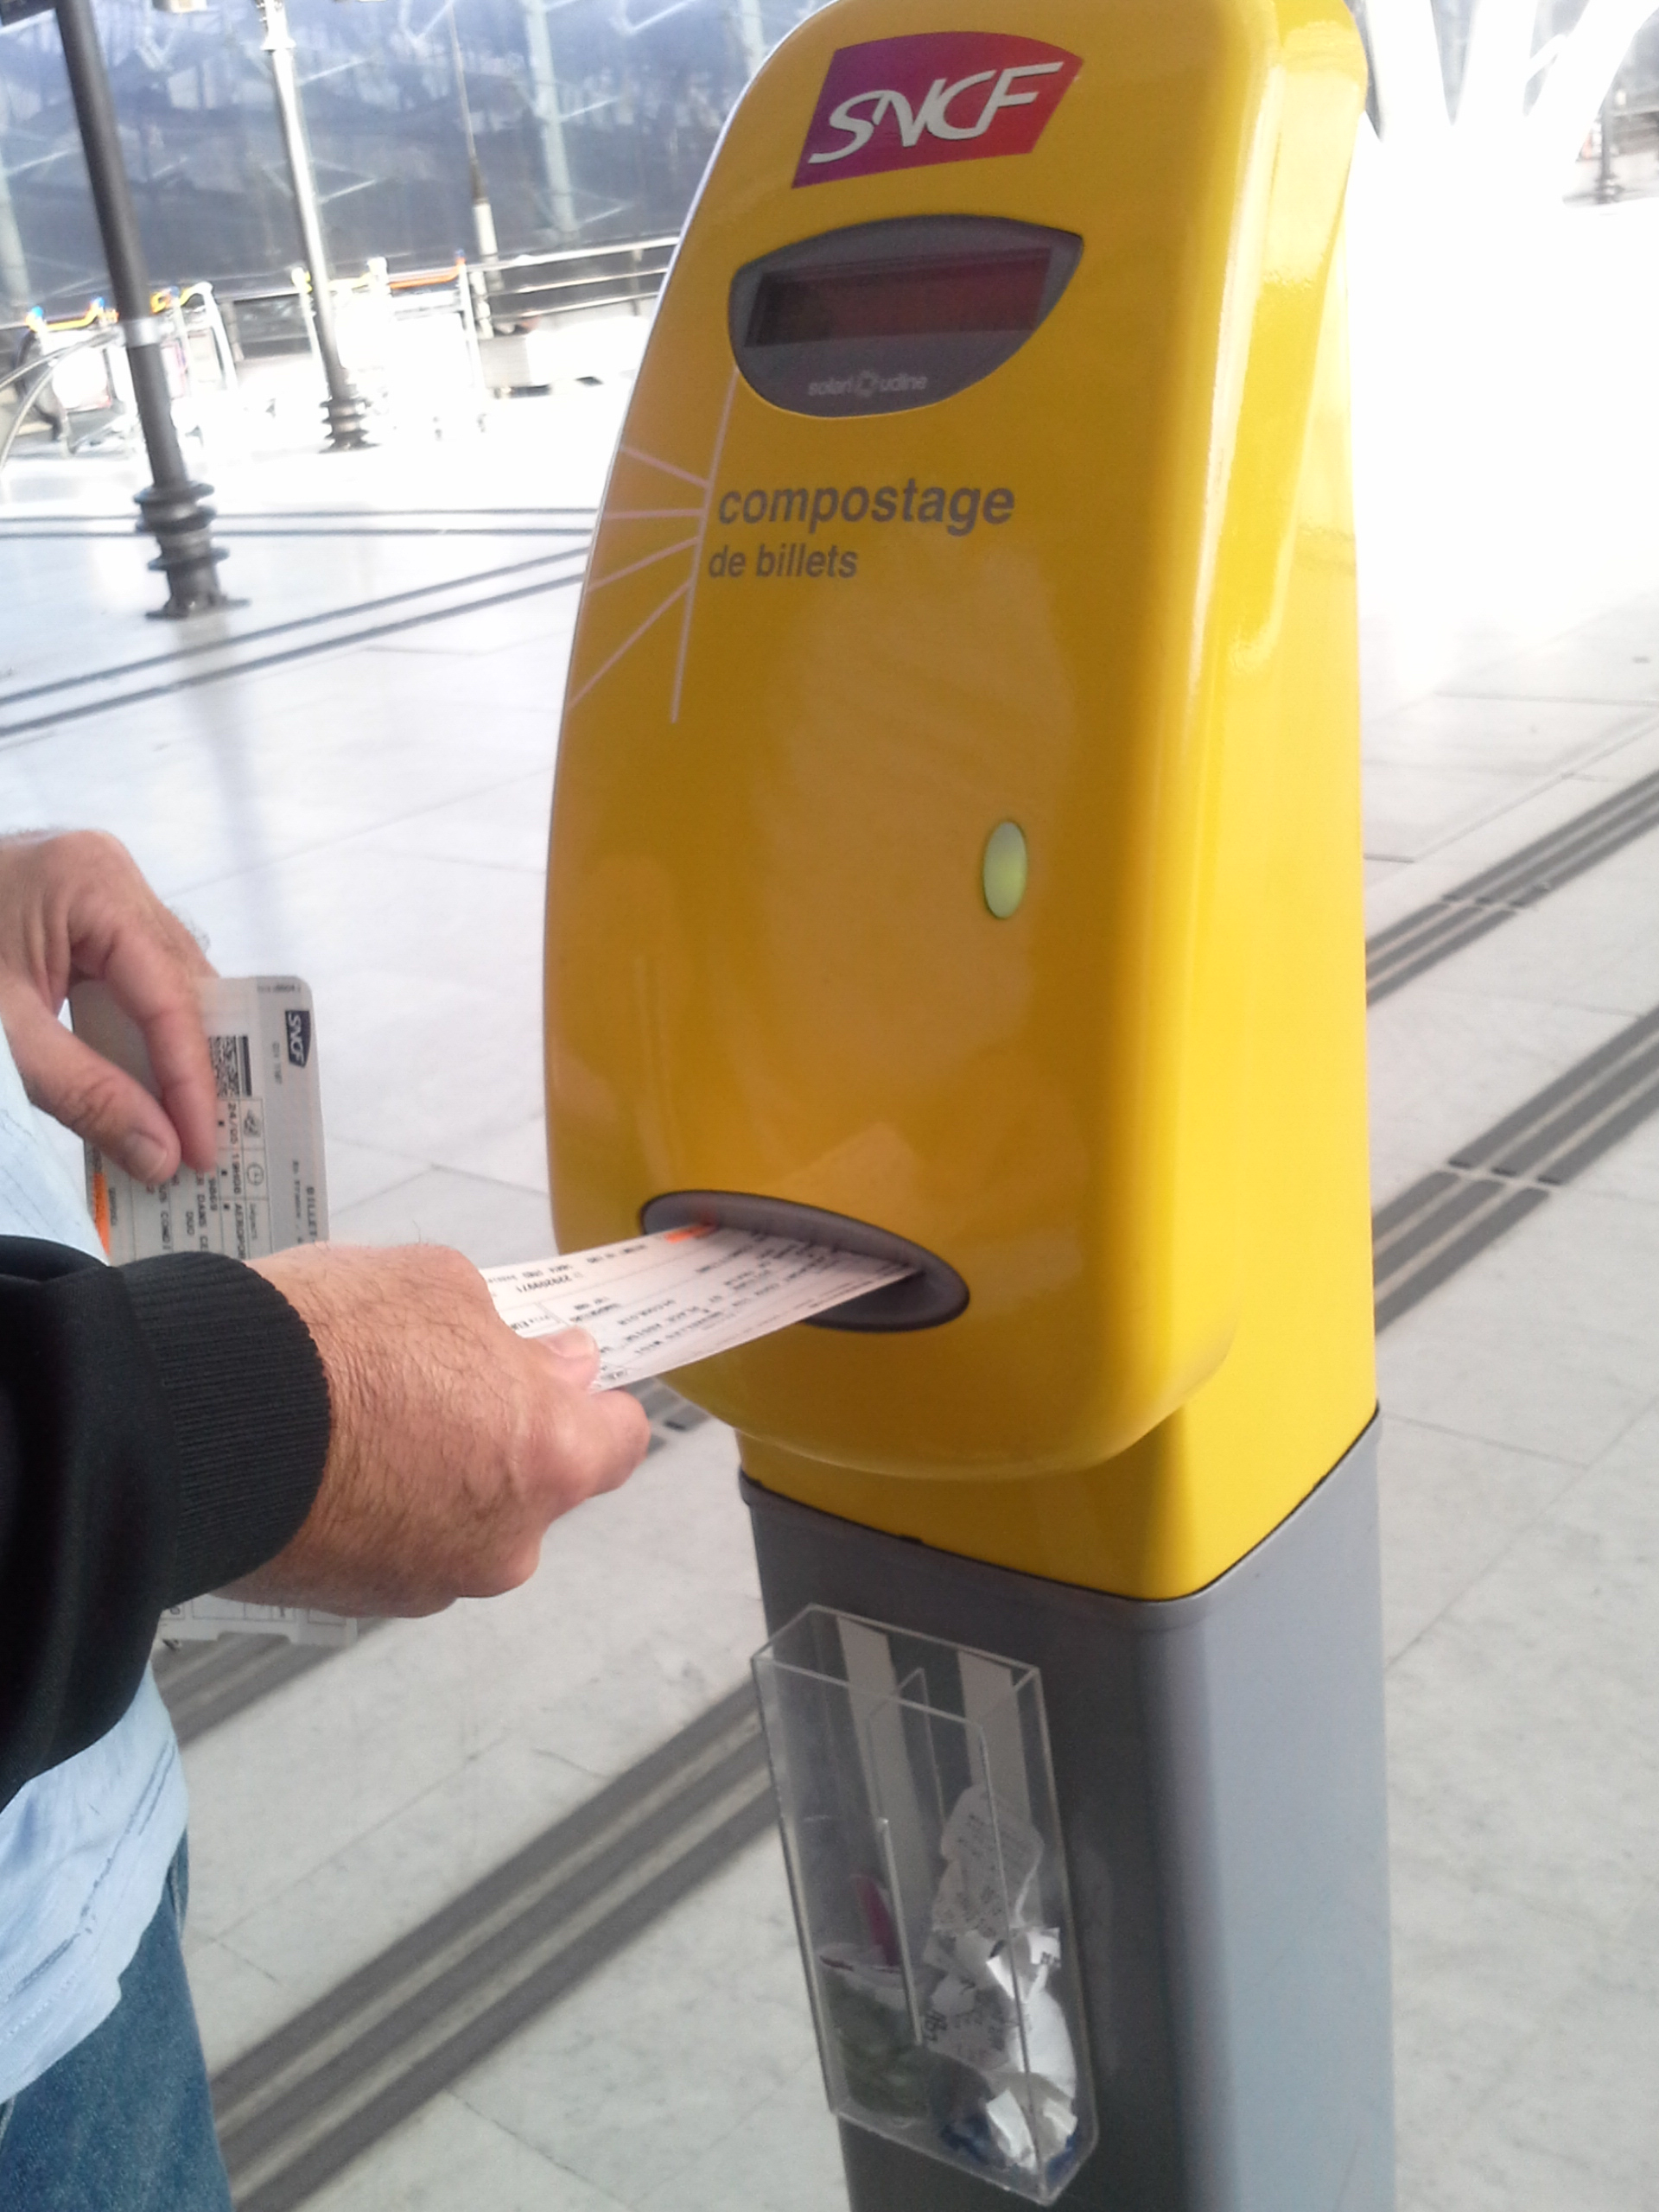 validar-bilhete-trem